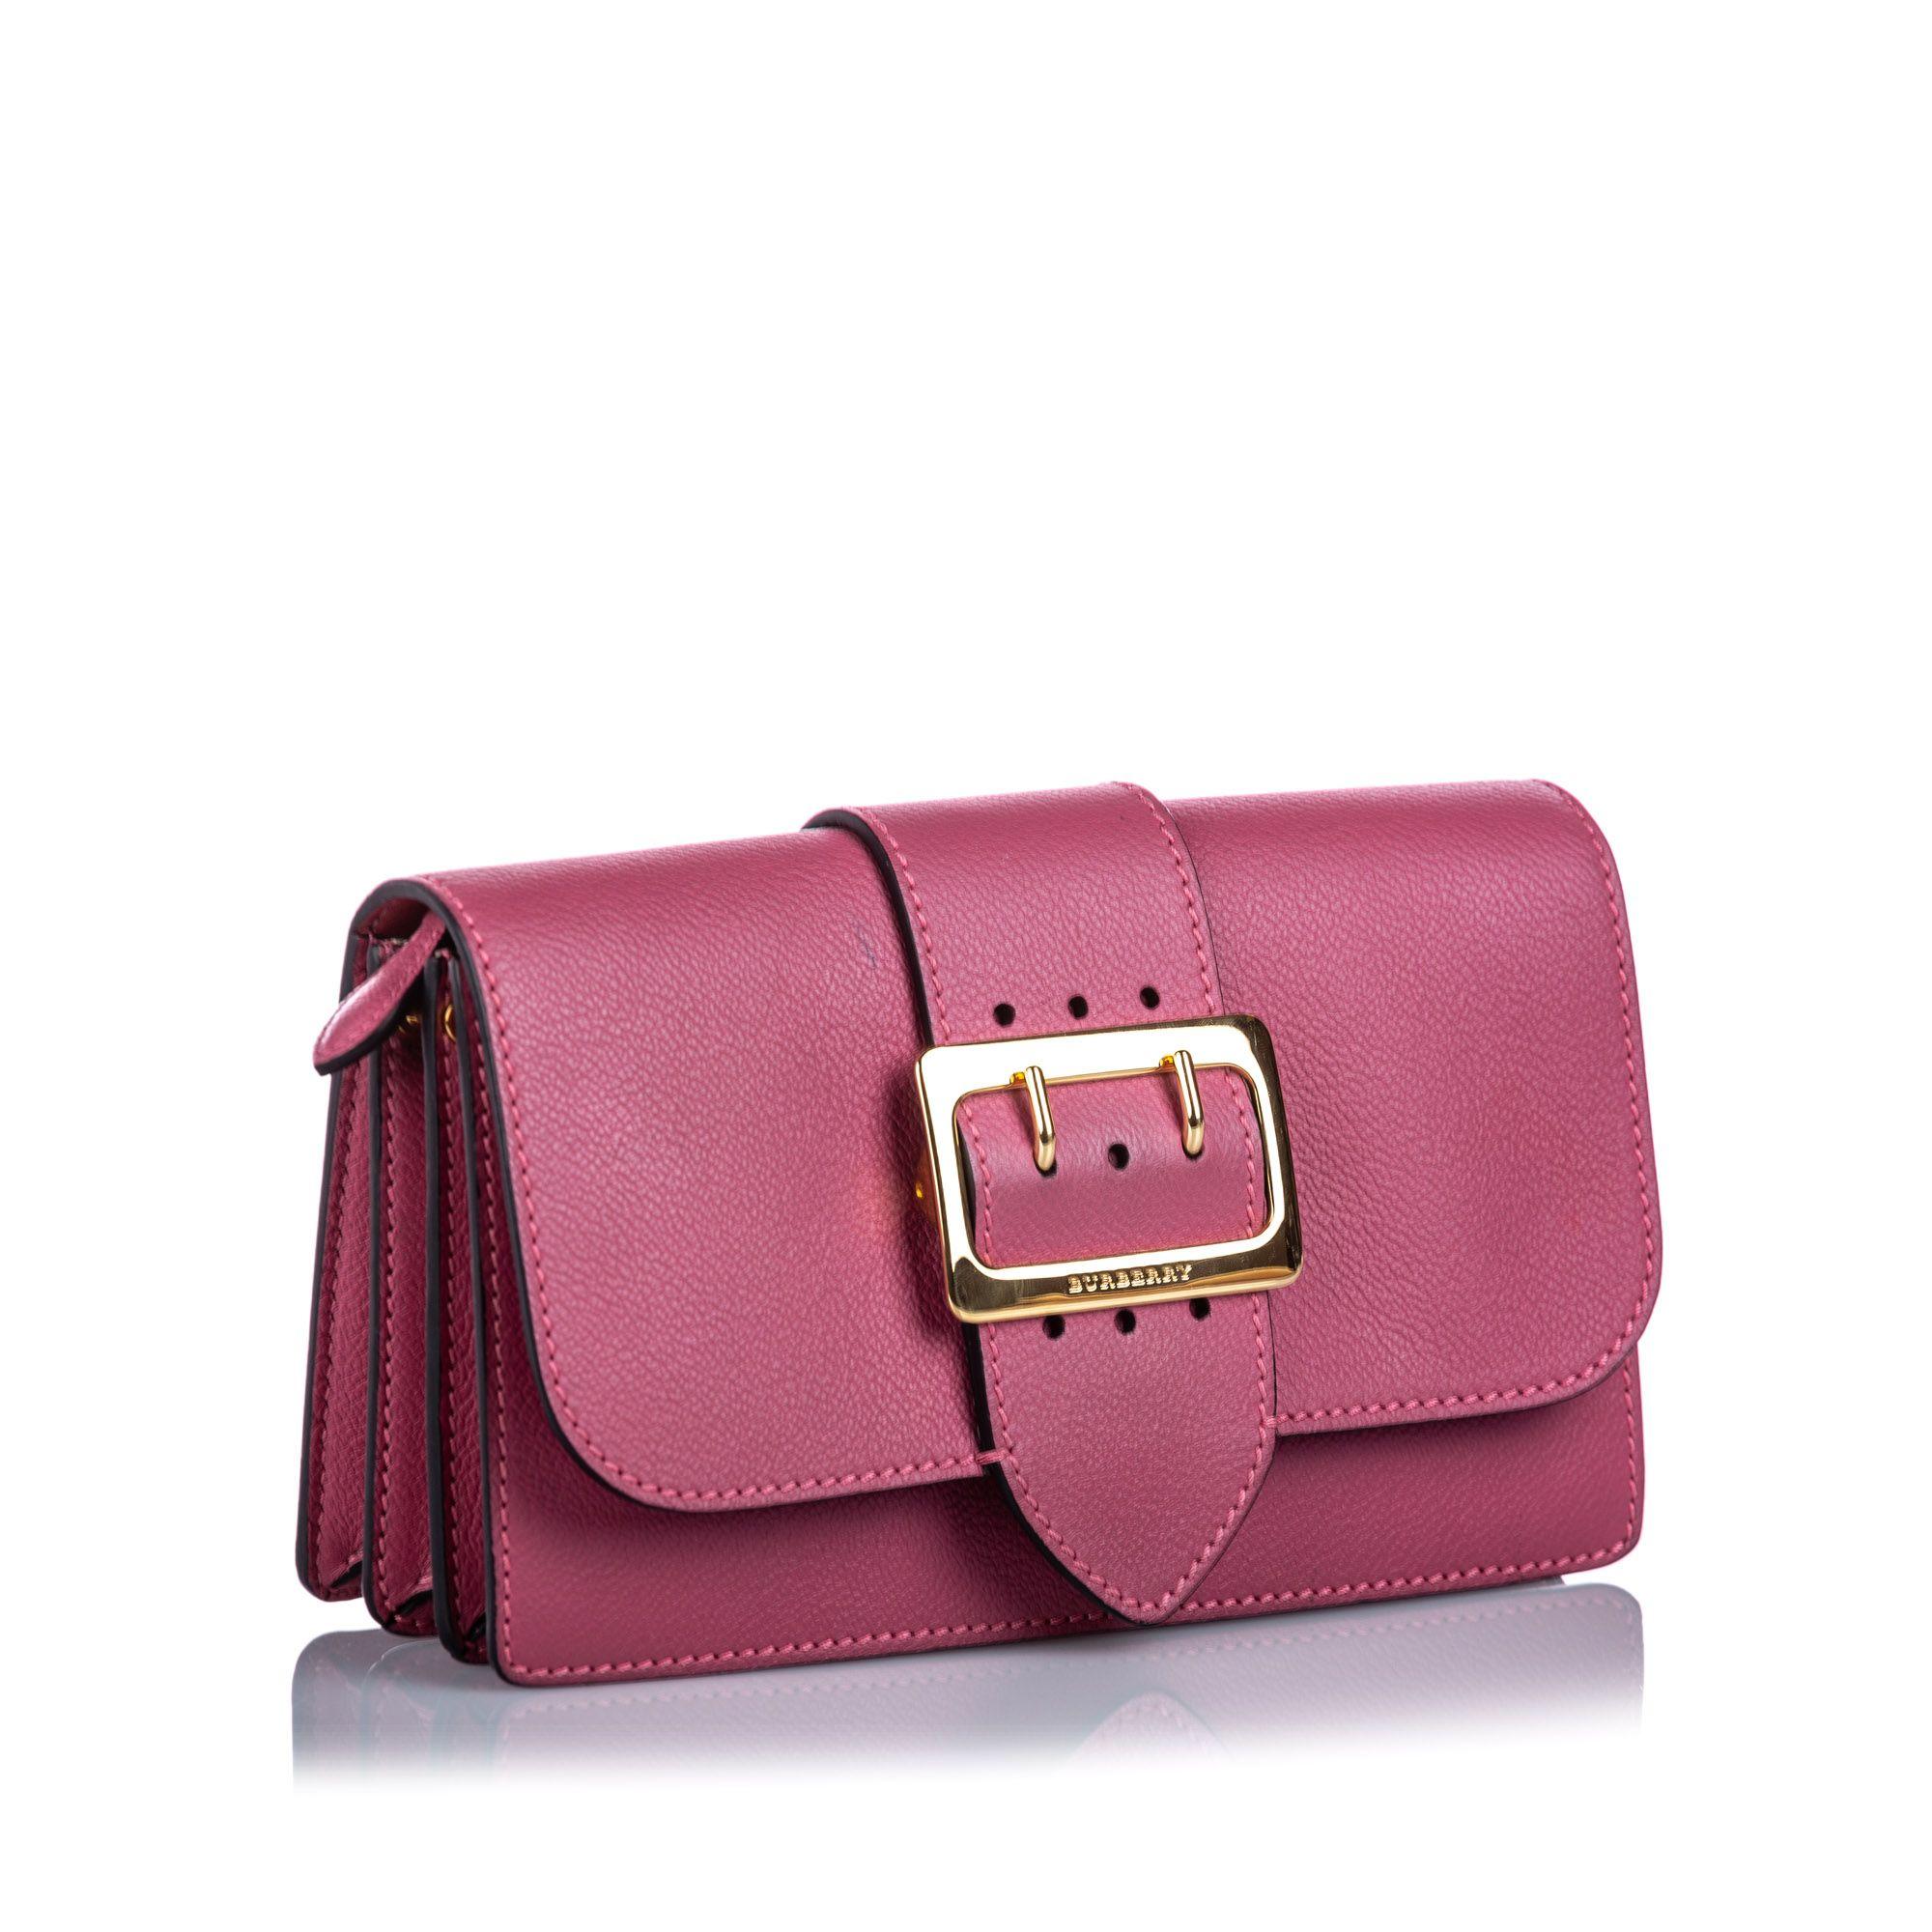 Vintage Burberry Leather Buckle Crossbody Bag Pink